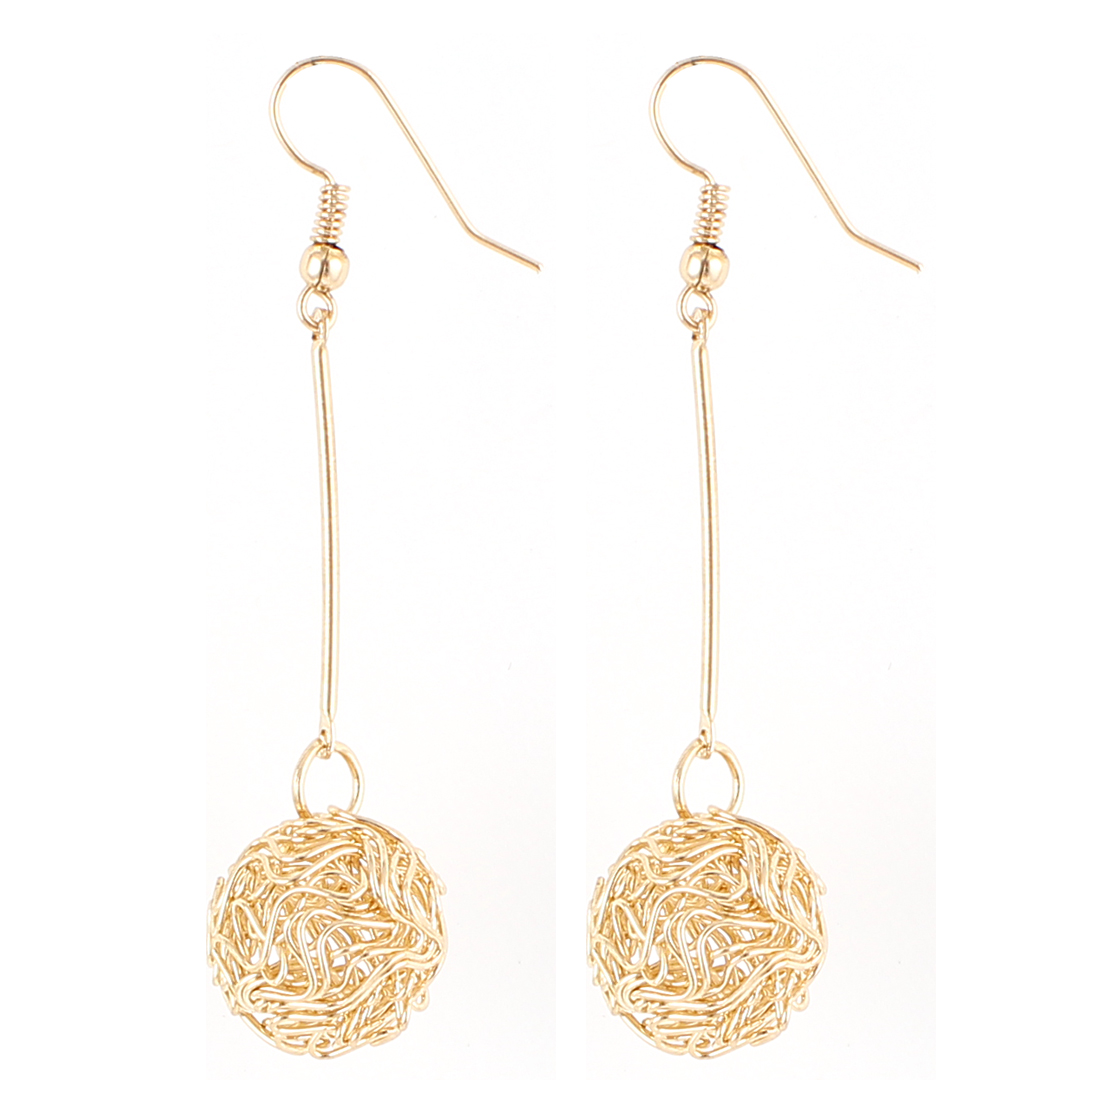 Lady Round Knot Dangle Drop Fish Hook Earrings Eardrop Earbob Gold Tone Pair